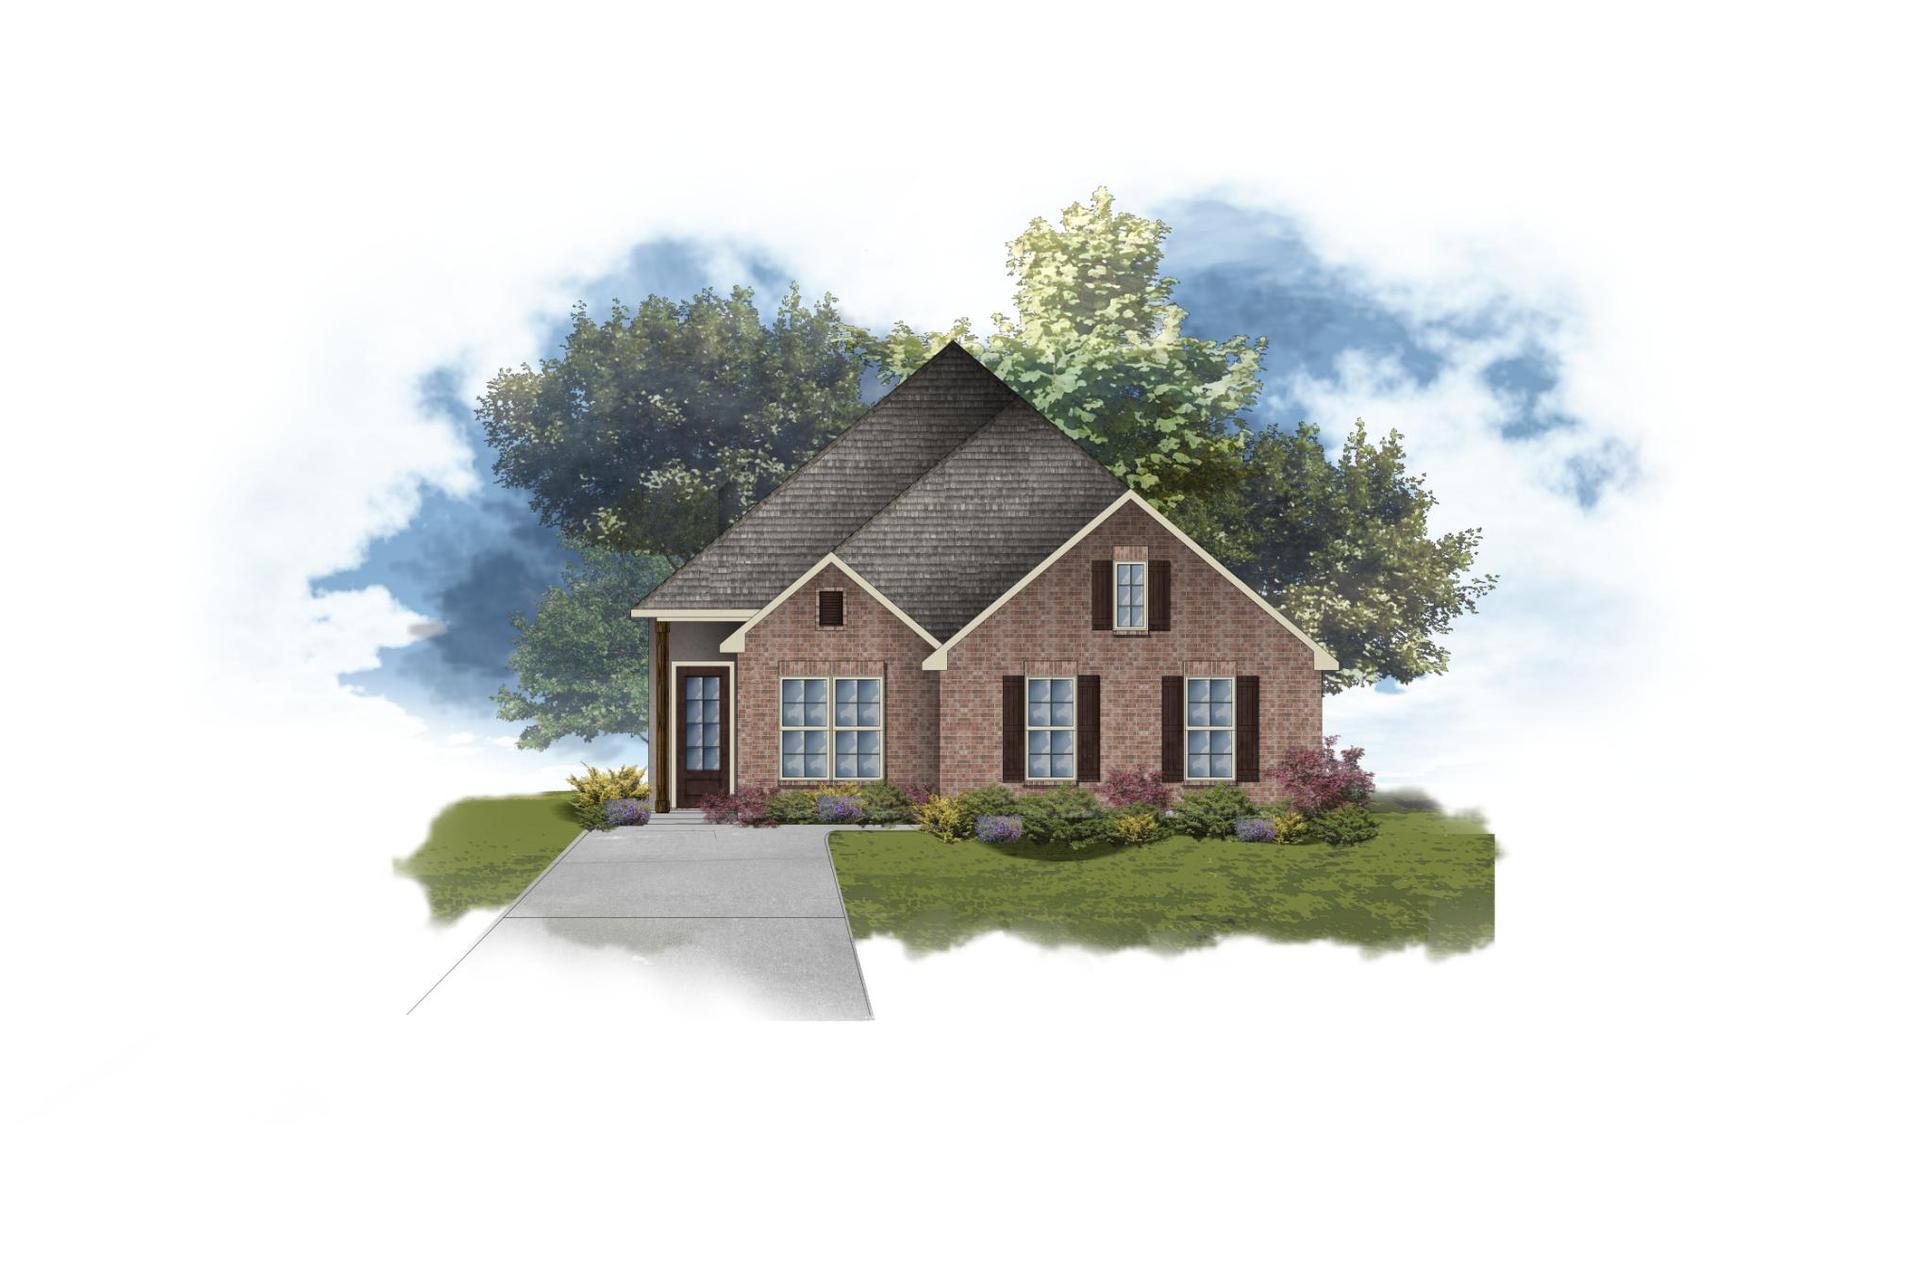 DSLD Homes - Aubry II A Open Floor-Plan Elevation Image